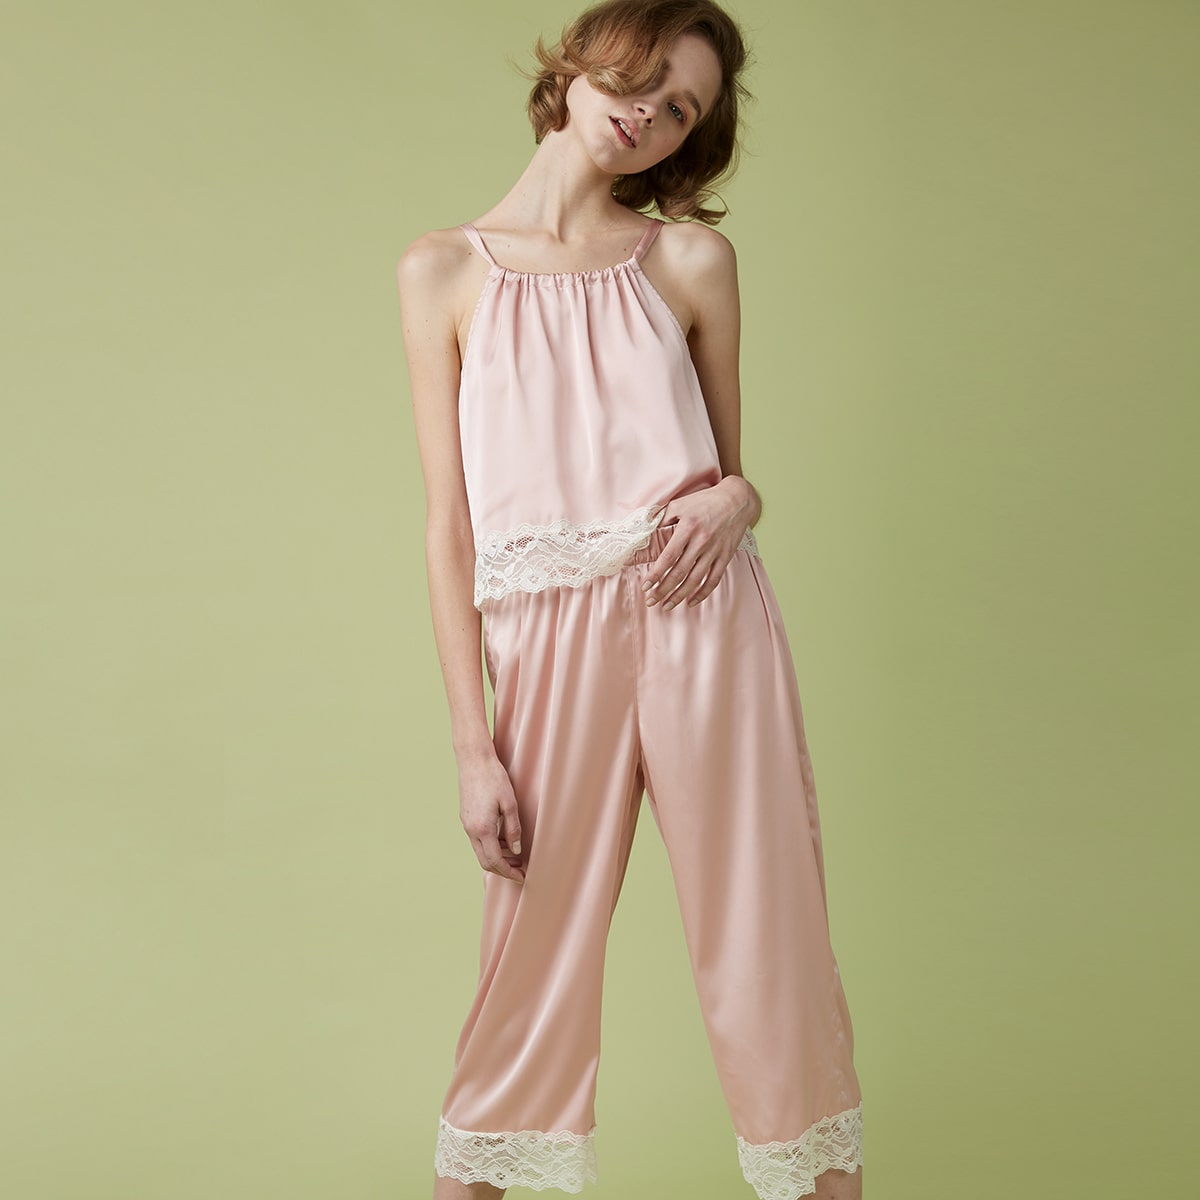 Контрастные кружева Контрастный цвет Повседневный Ночная пижама